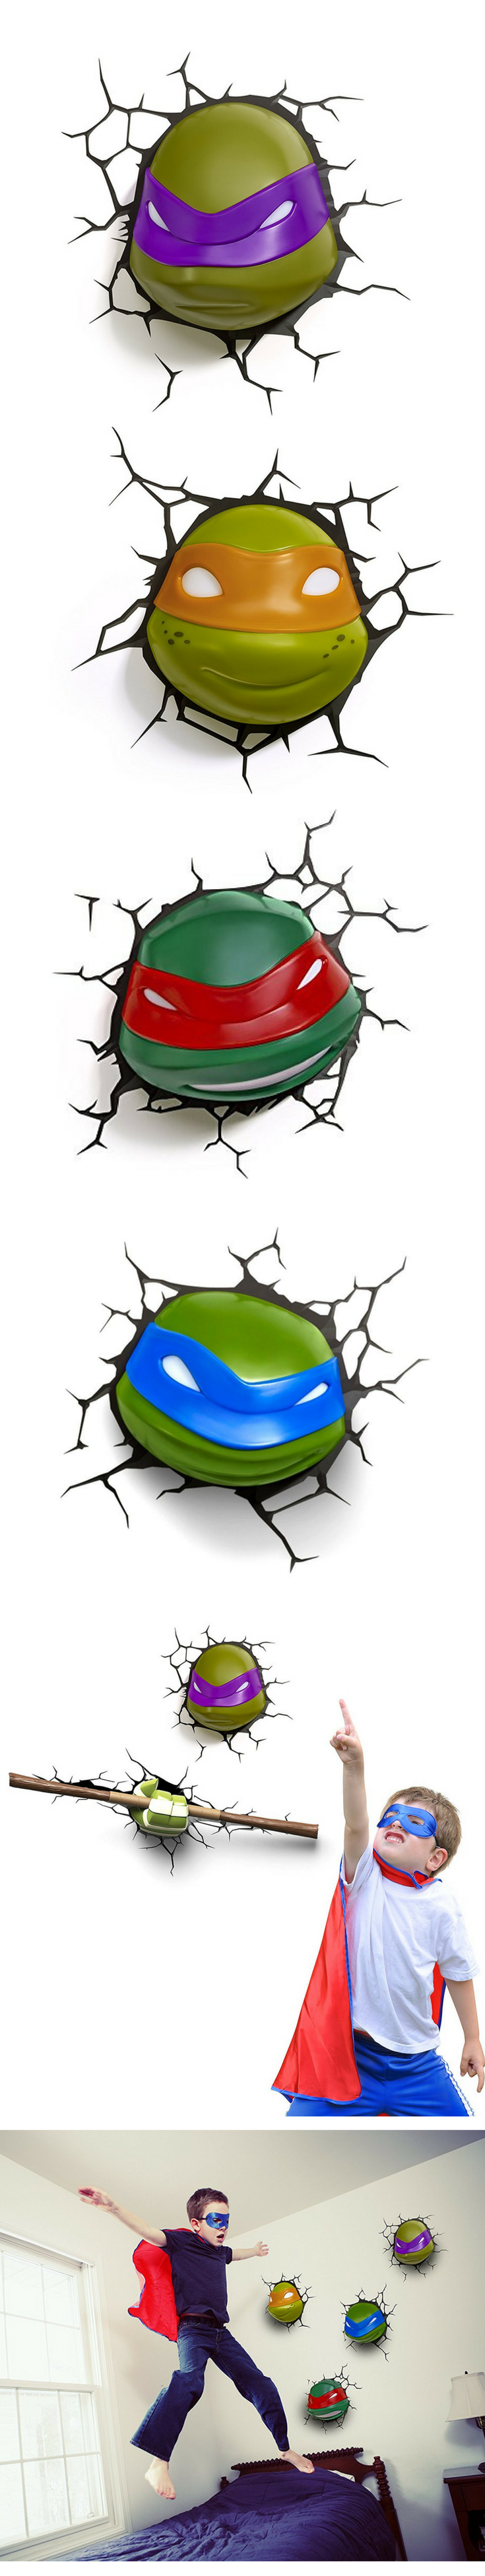 Pin Auf Kinderzimmer Ninja Turtles